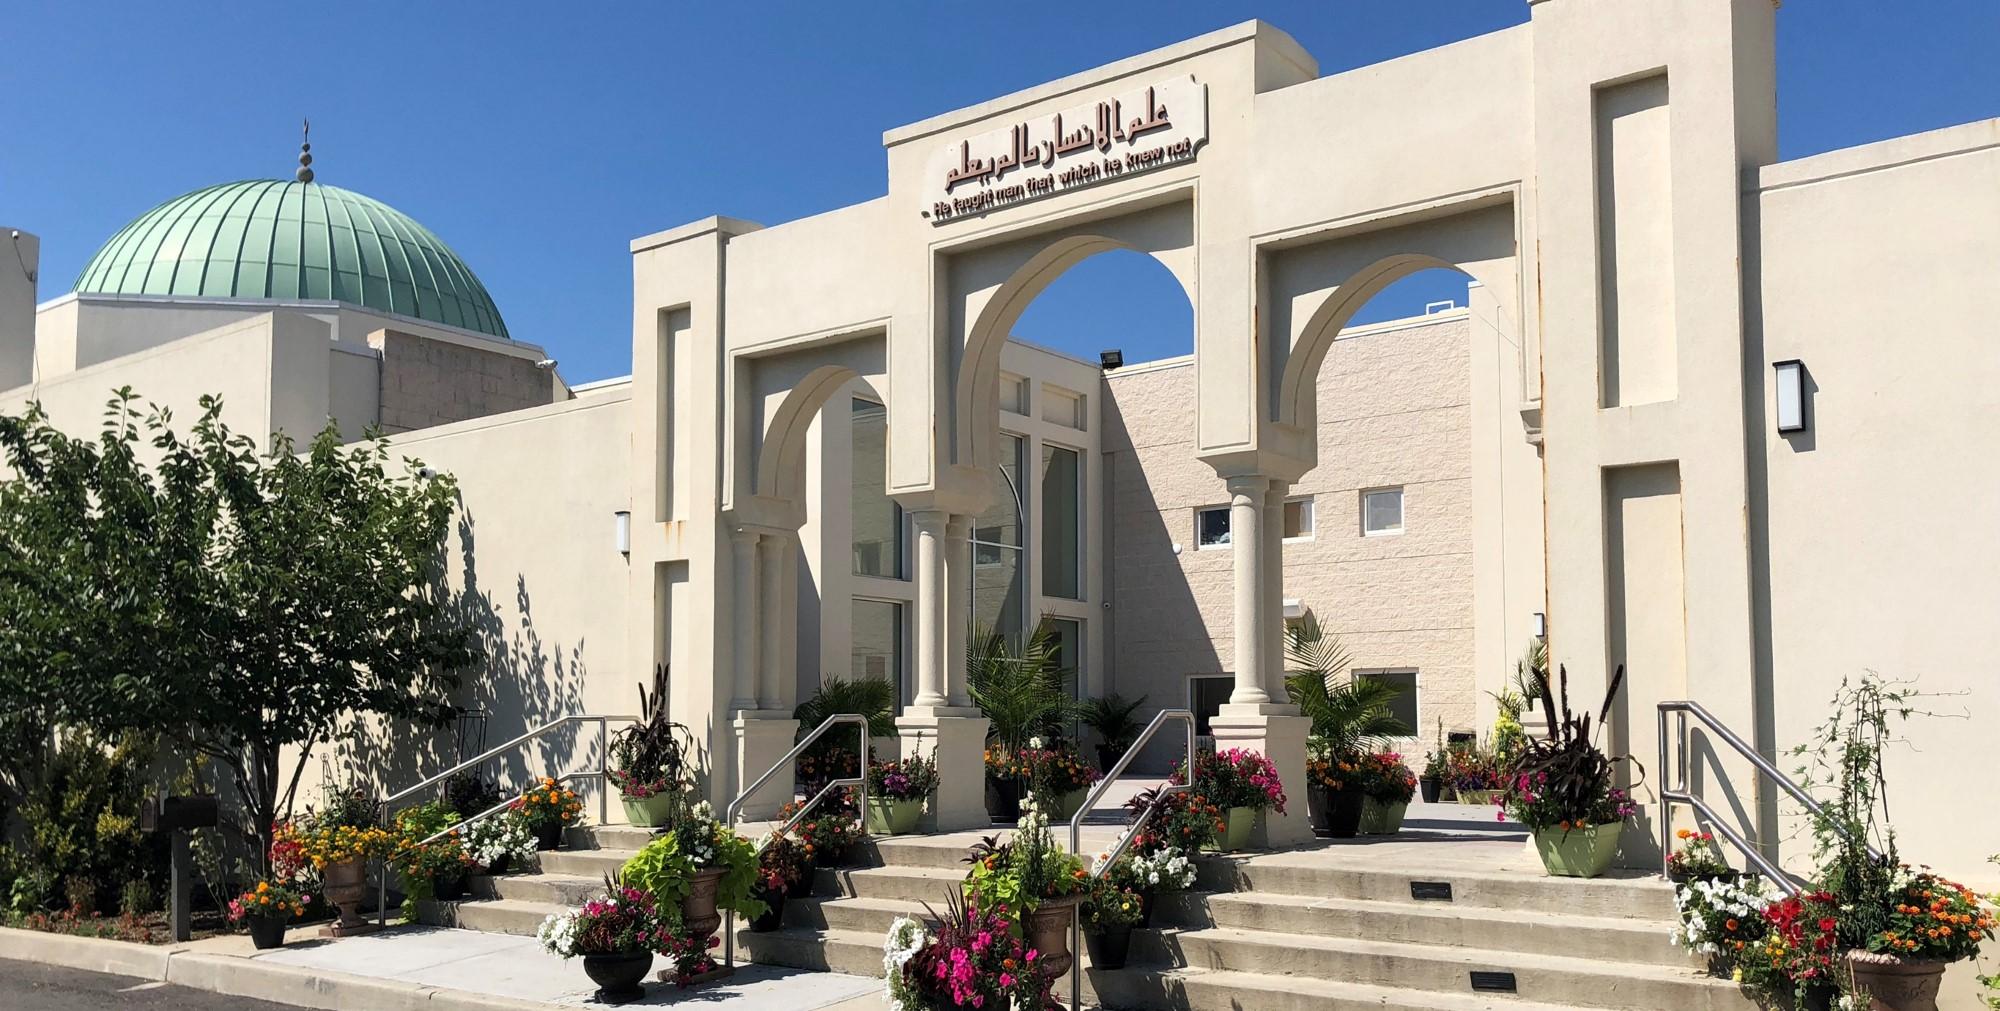 Islamic Center of Long Island